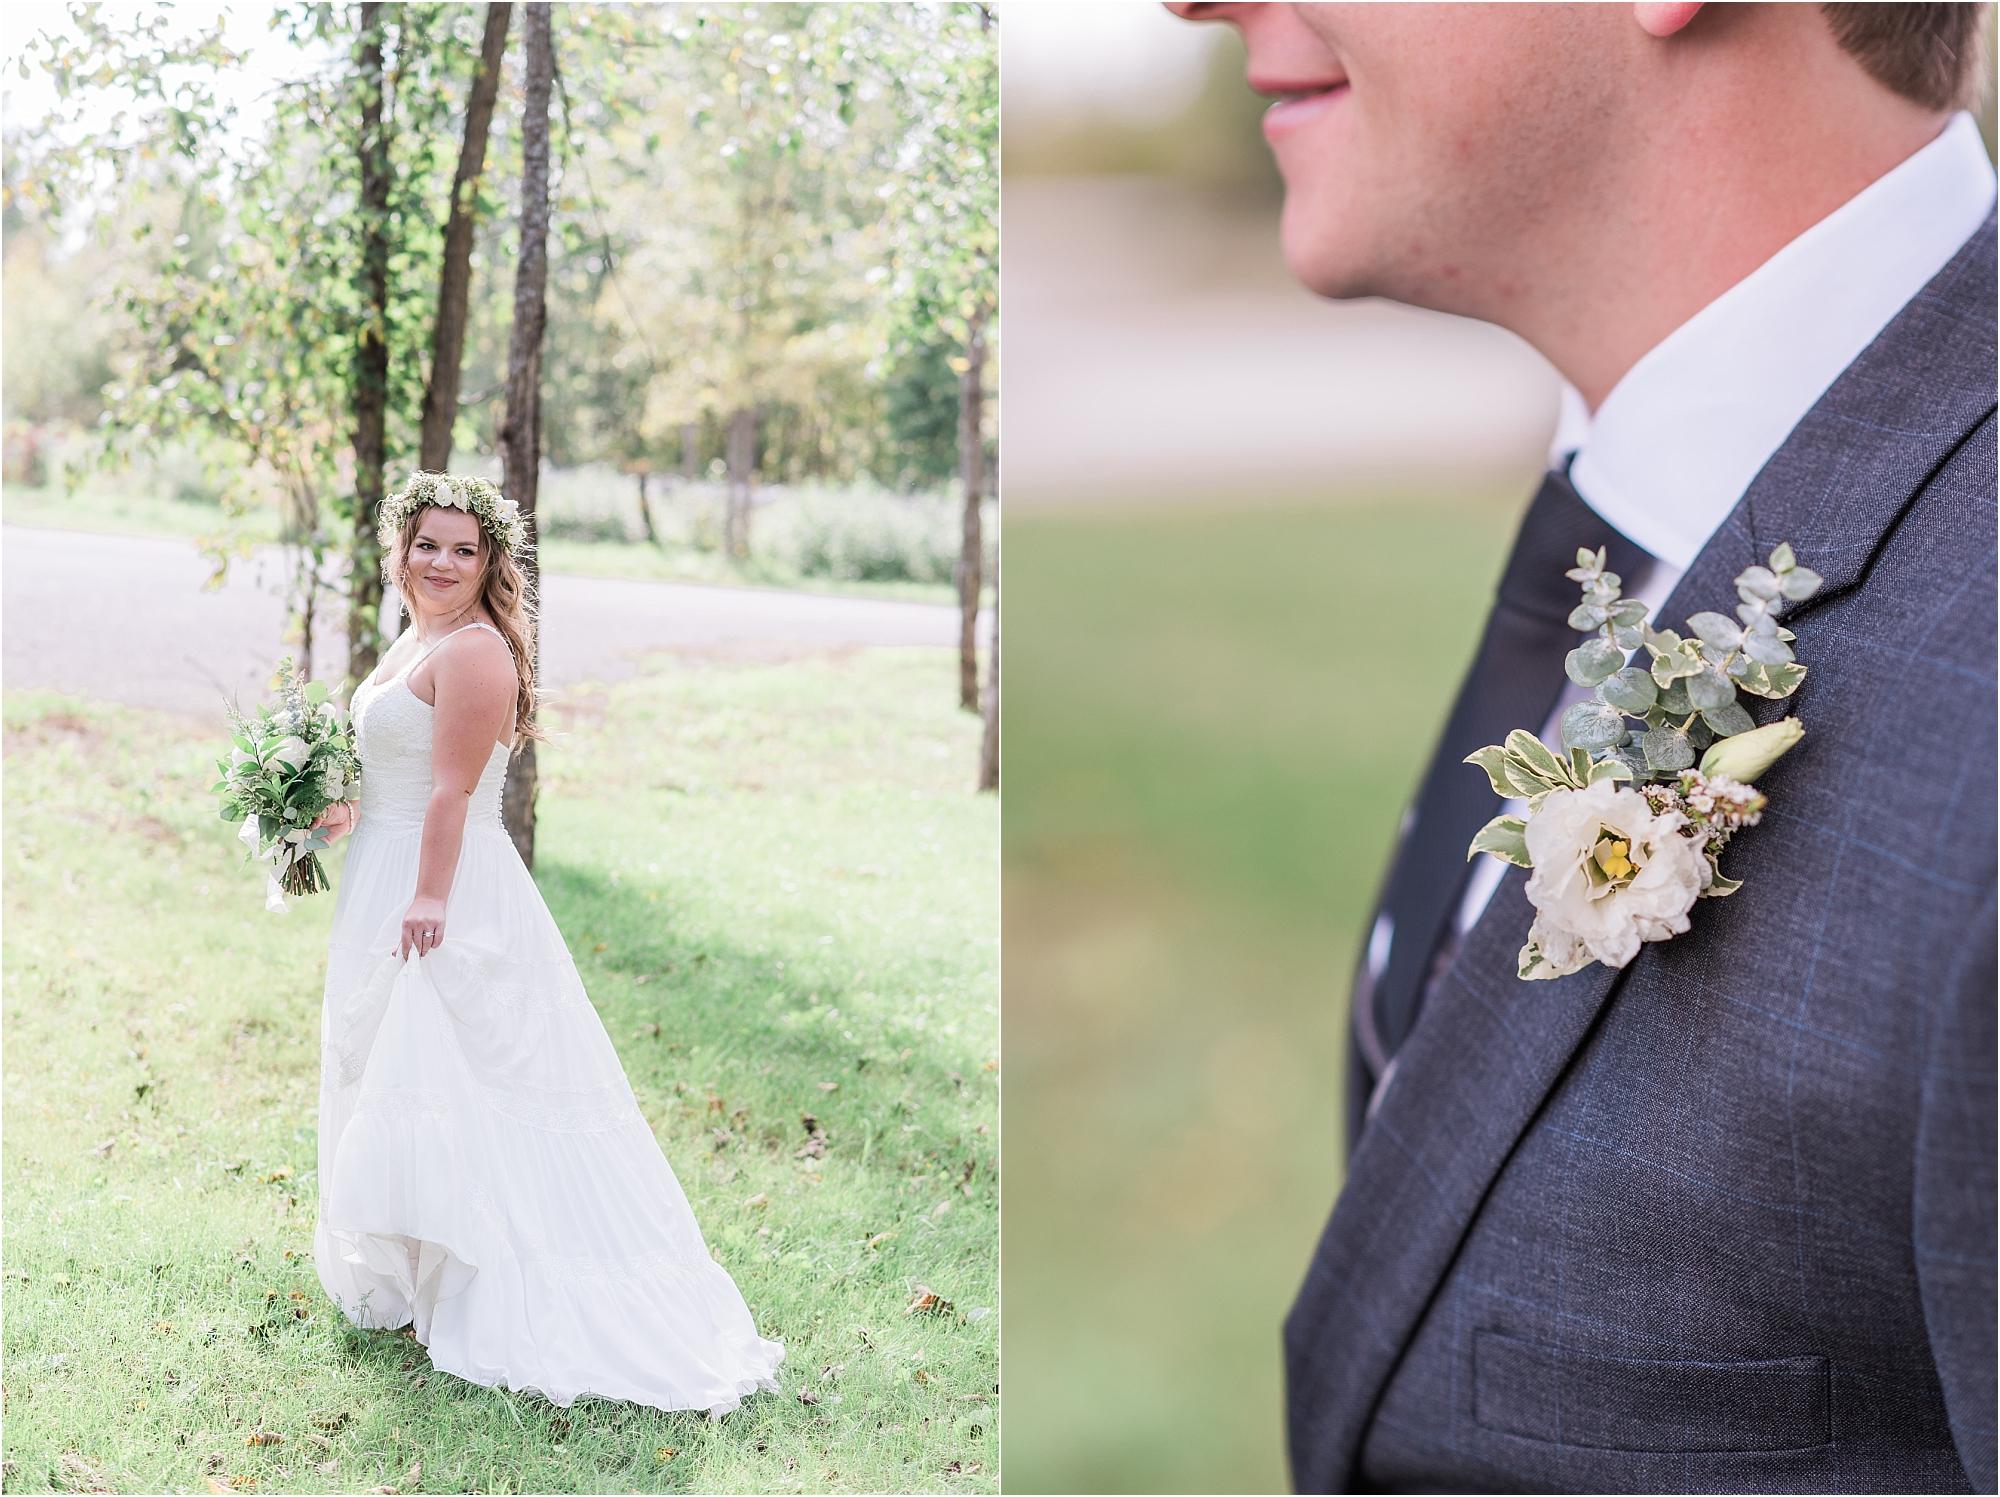 0049 Summer Stonefields Wedding Carleton Place - Ottawa Wedding - Photography by Emma_WEB.jpg